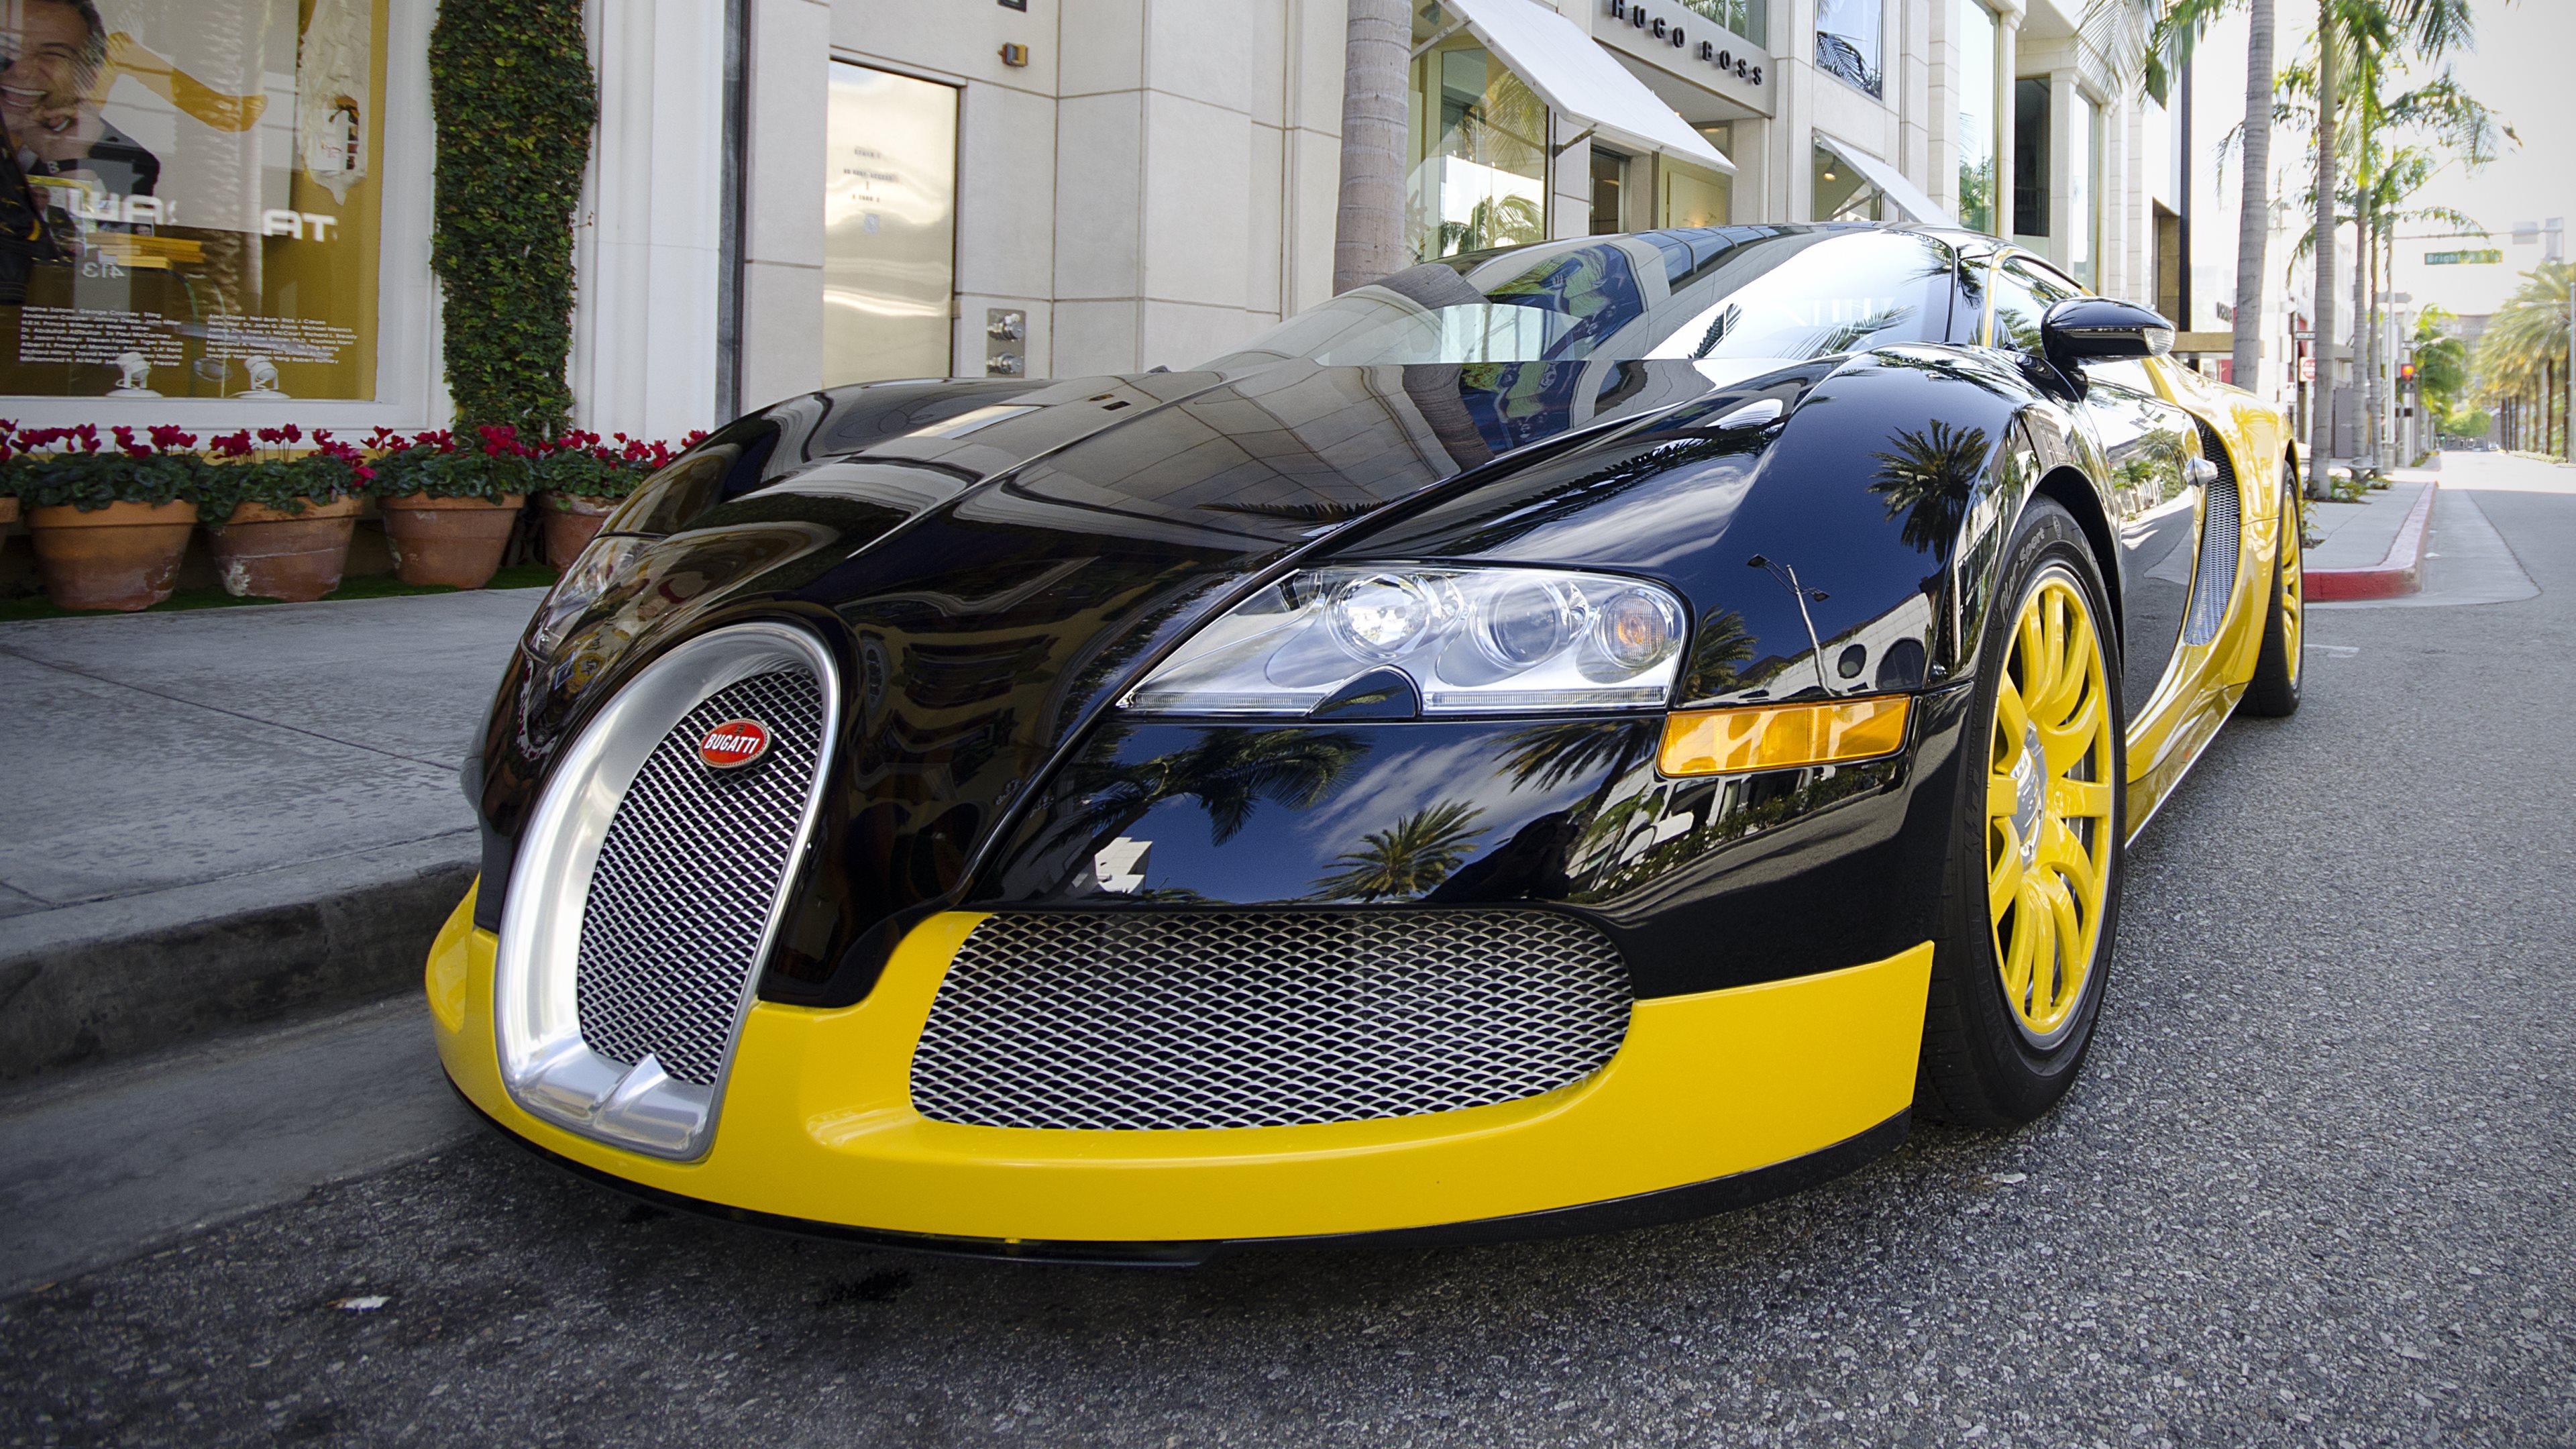 Bugatti Veyron Super Sport 4k Wallpaper: Bugatti_Veyron 4k Ultra HD Wallpaper